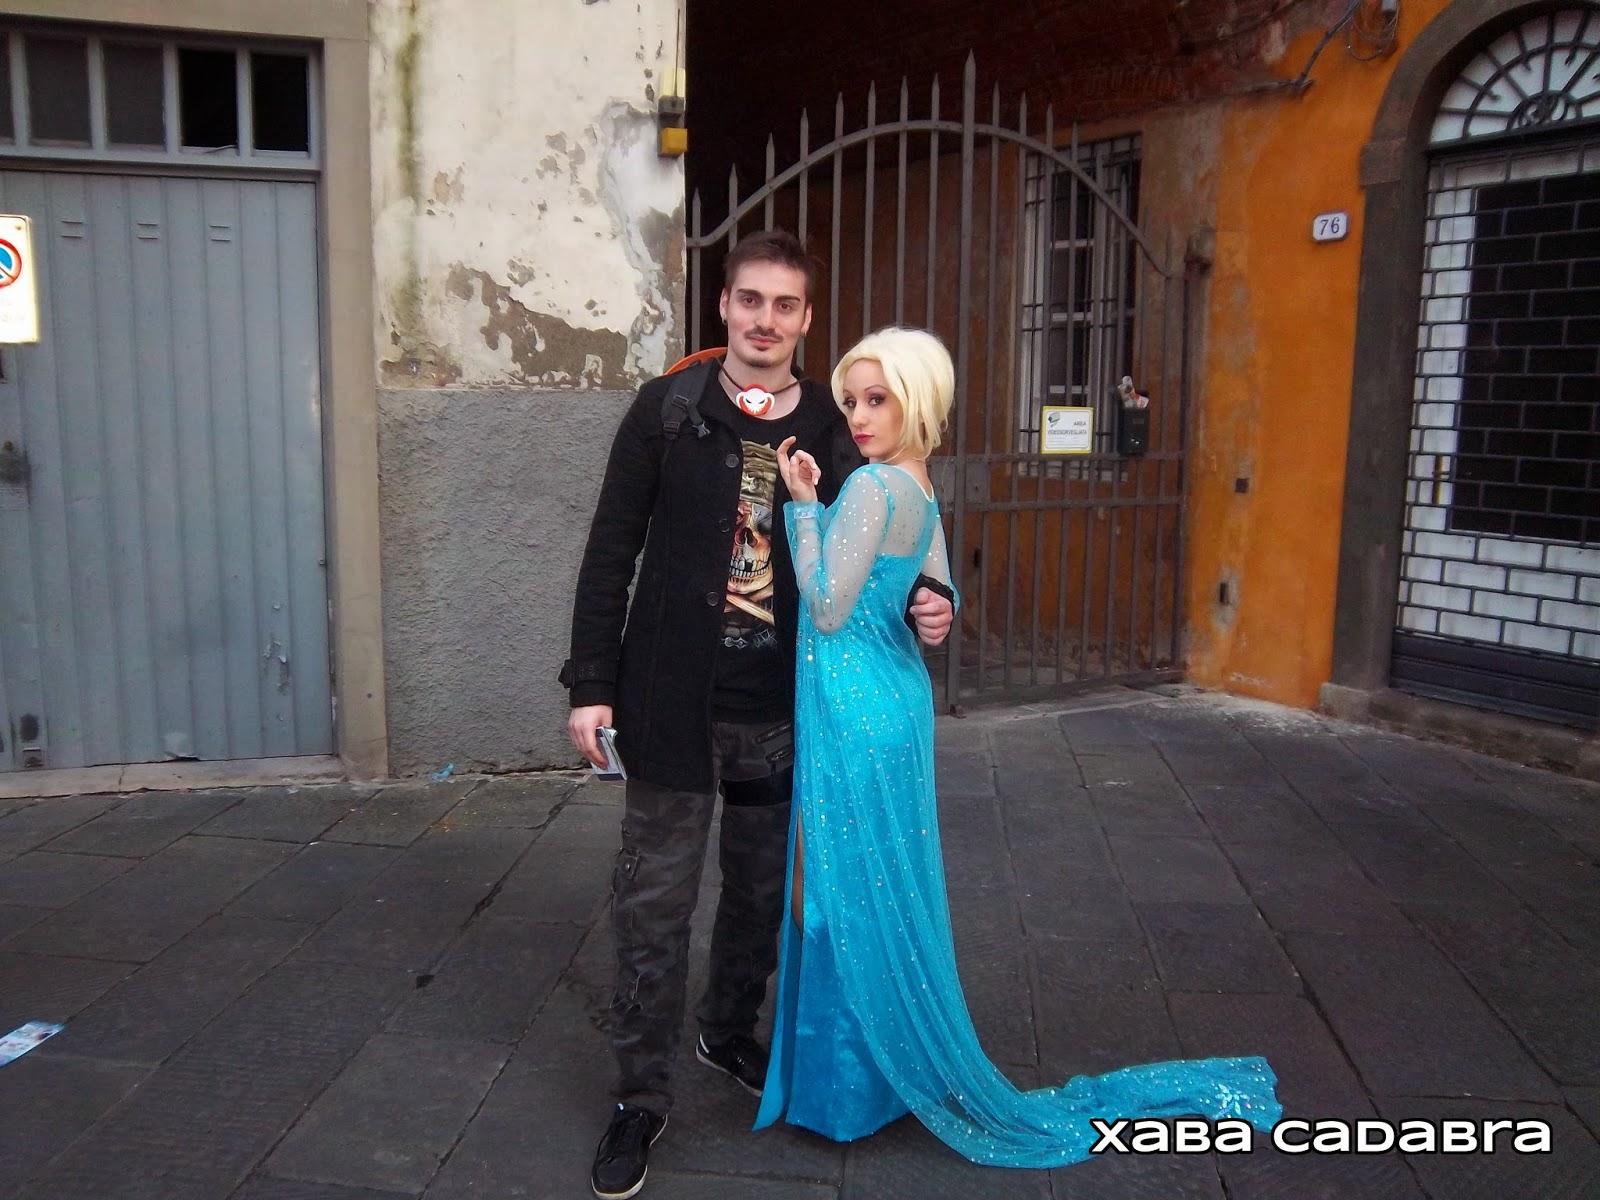 Io ed Elsa